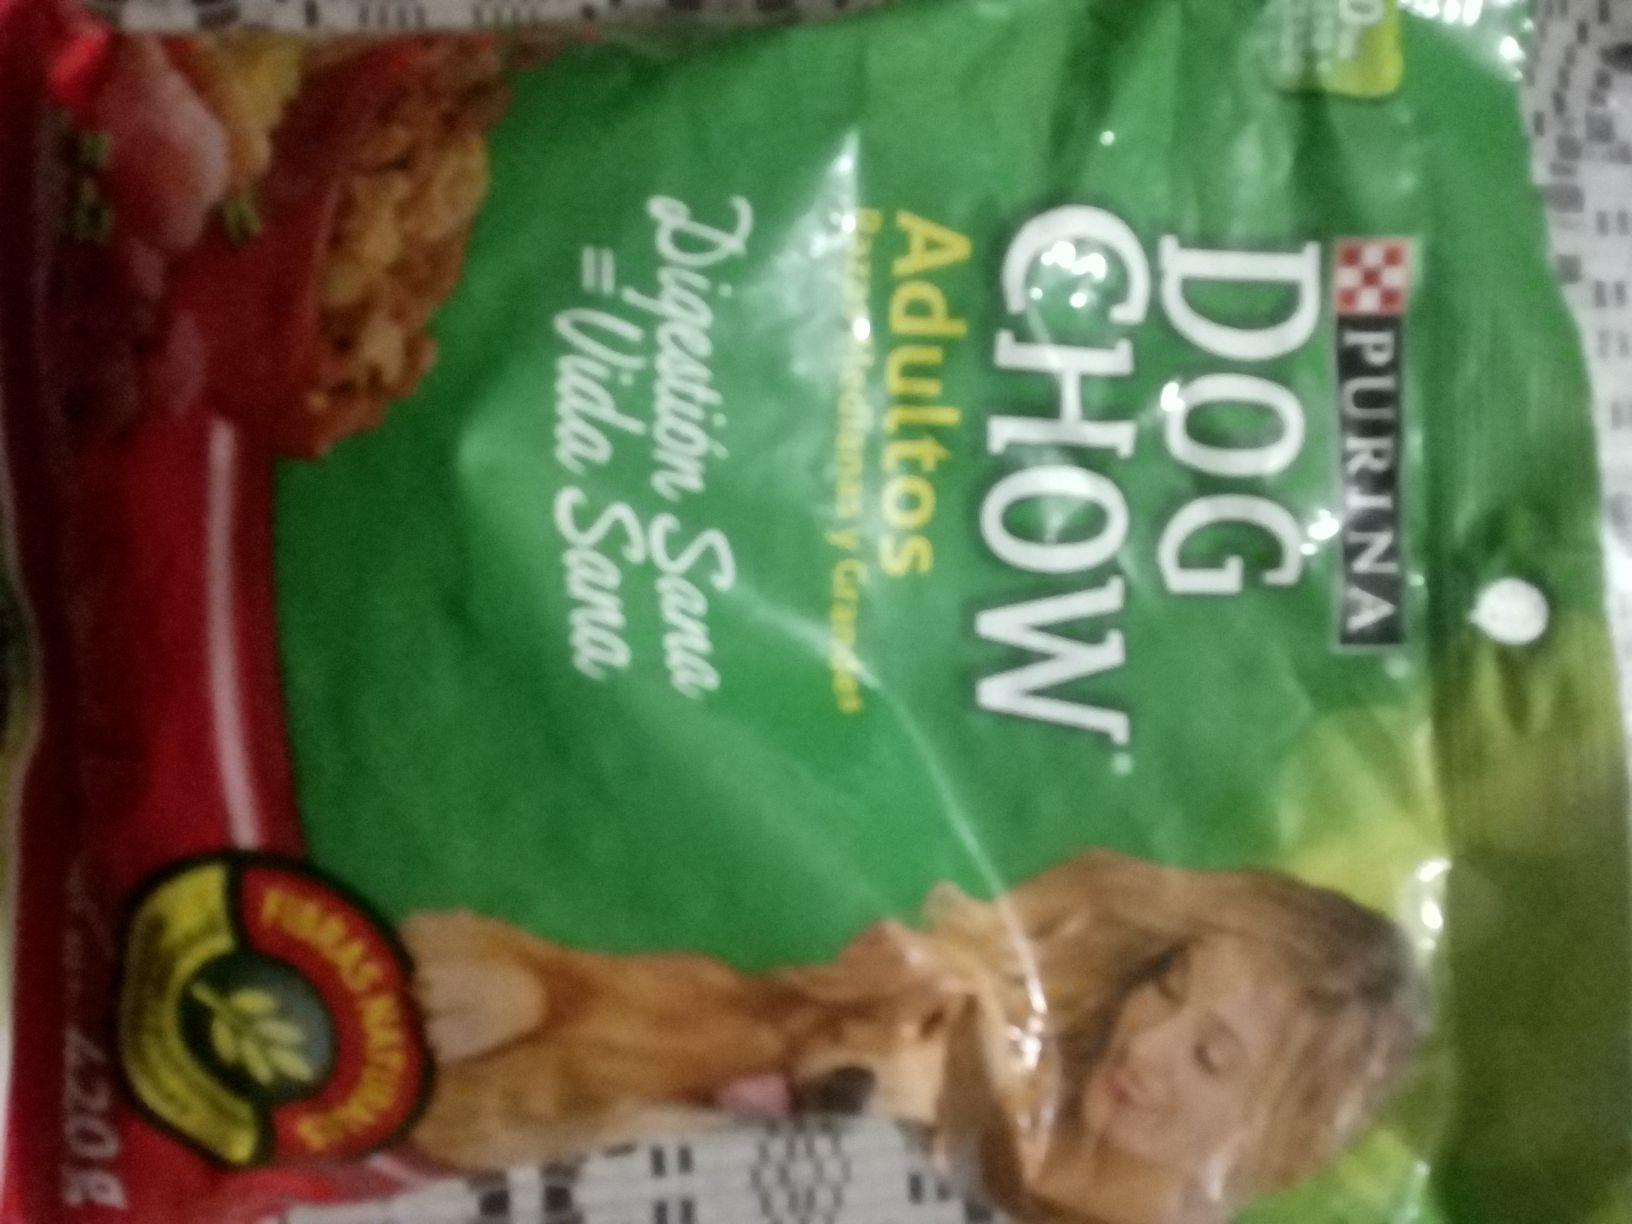 Bodega Aurrera: Sobre alimento Dog chow 420g